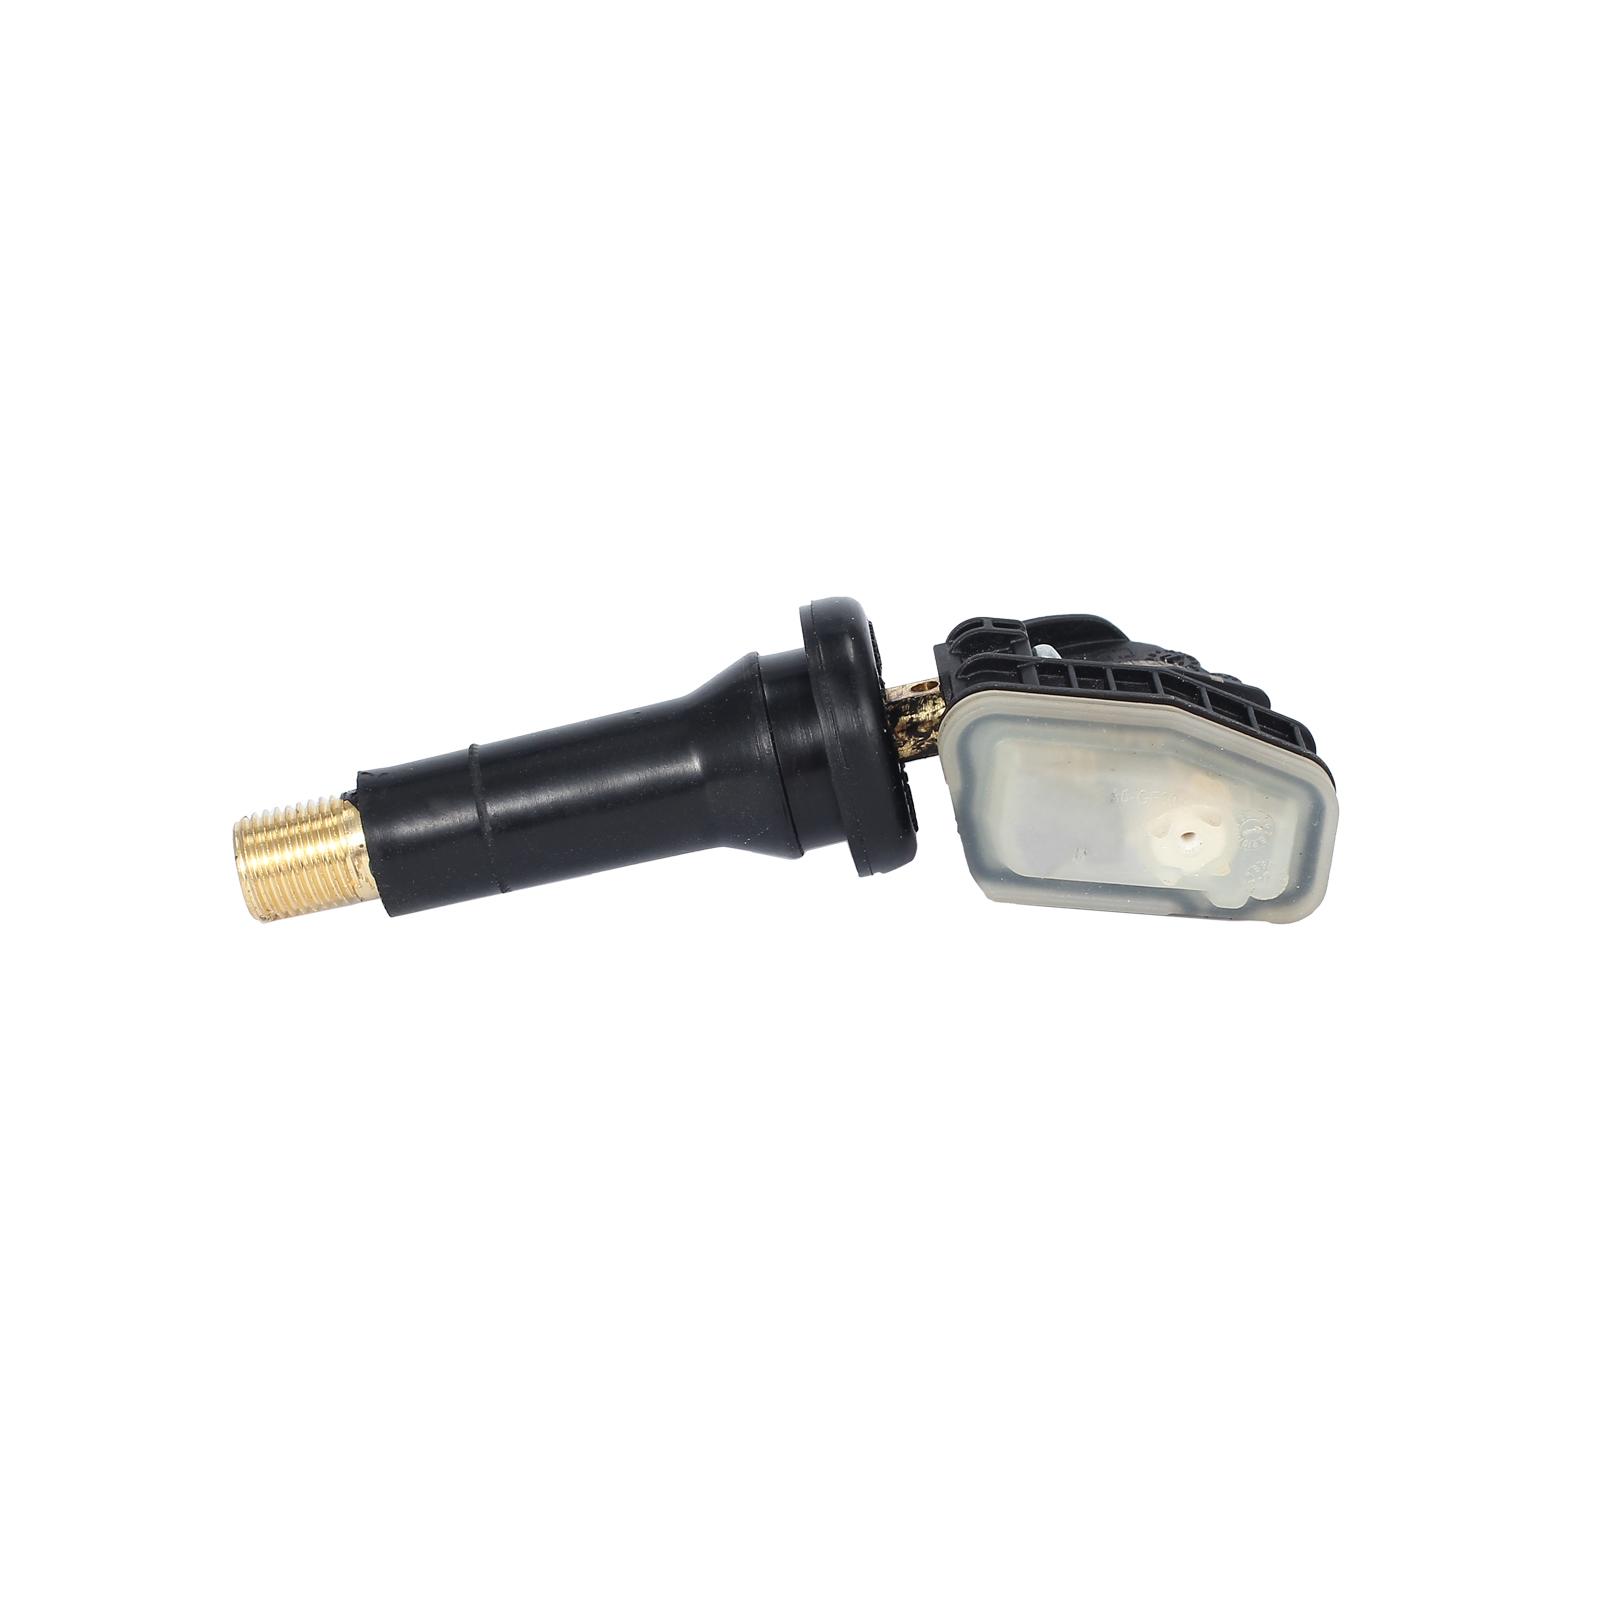 Ford Explorer Tire Pressure Sensor: Tire Pressure Sensor F2GT-1A180-AB For Ford 15-17 F-150